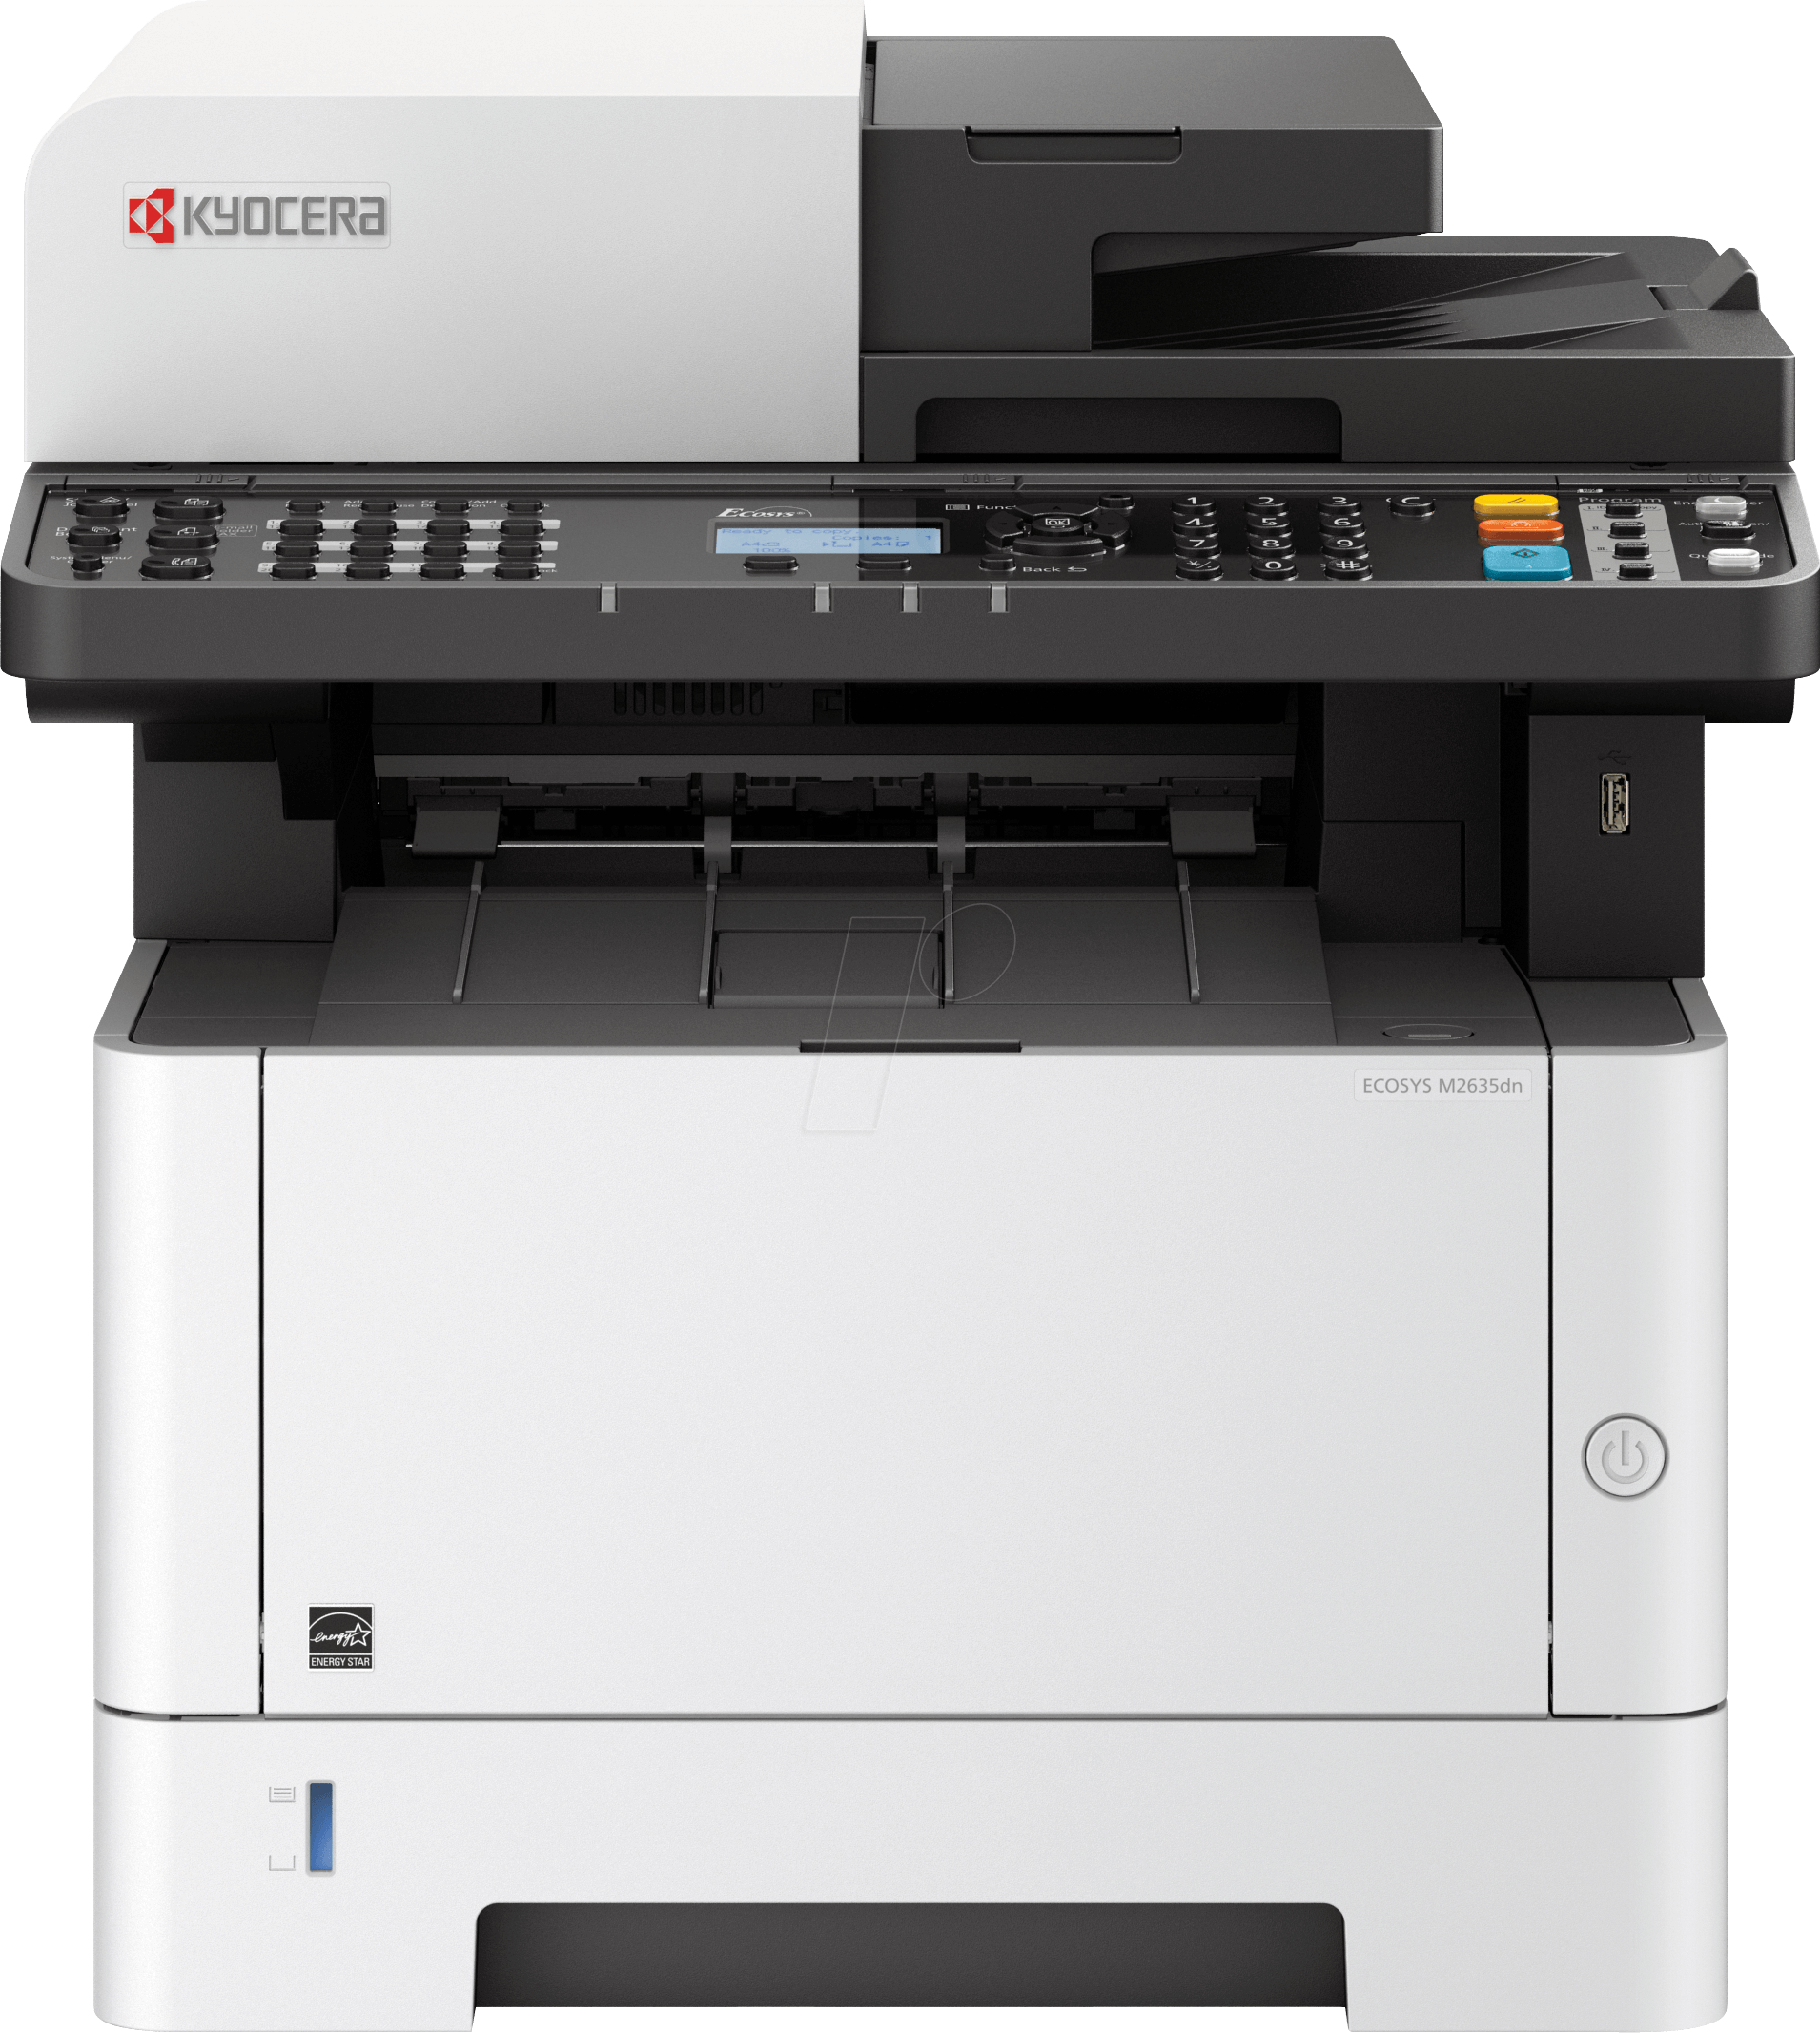 Kyocera ECOSYS M2635DN Laserdrucker, Multifunktion, mono, LAN, 35 S min, inkl. UHG